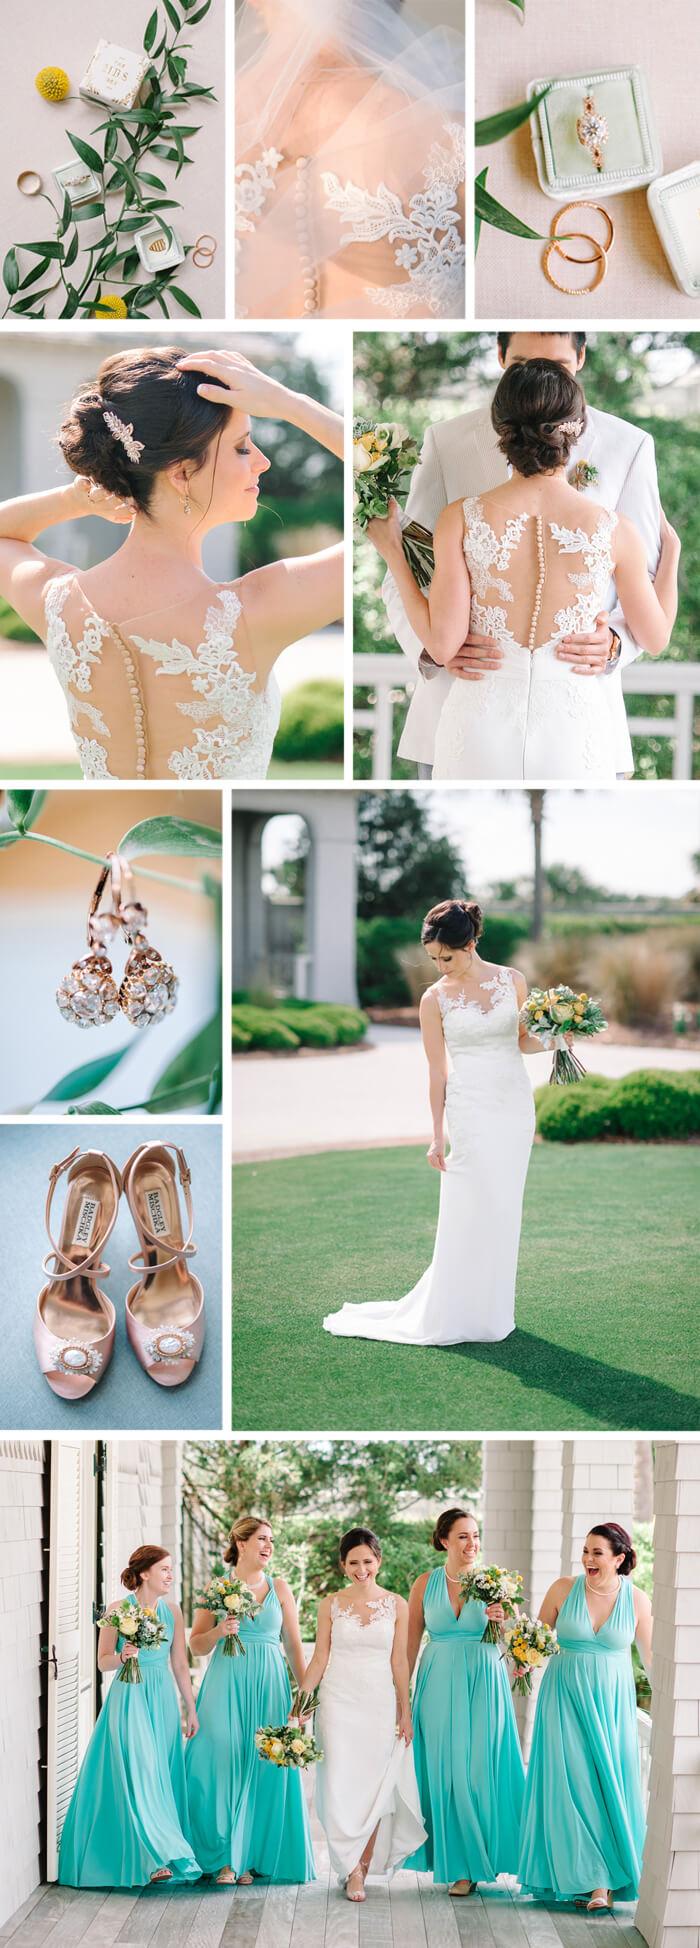 Brautjungfernkleider Türkis